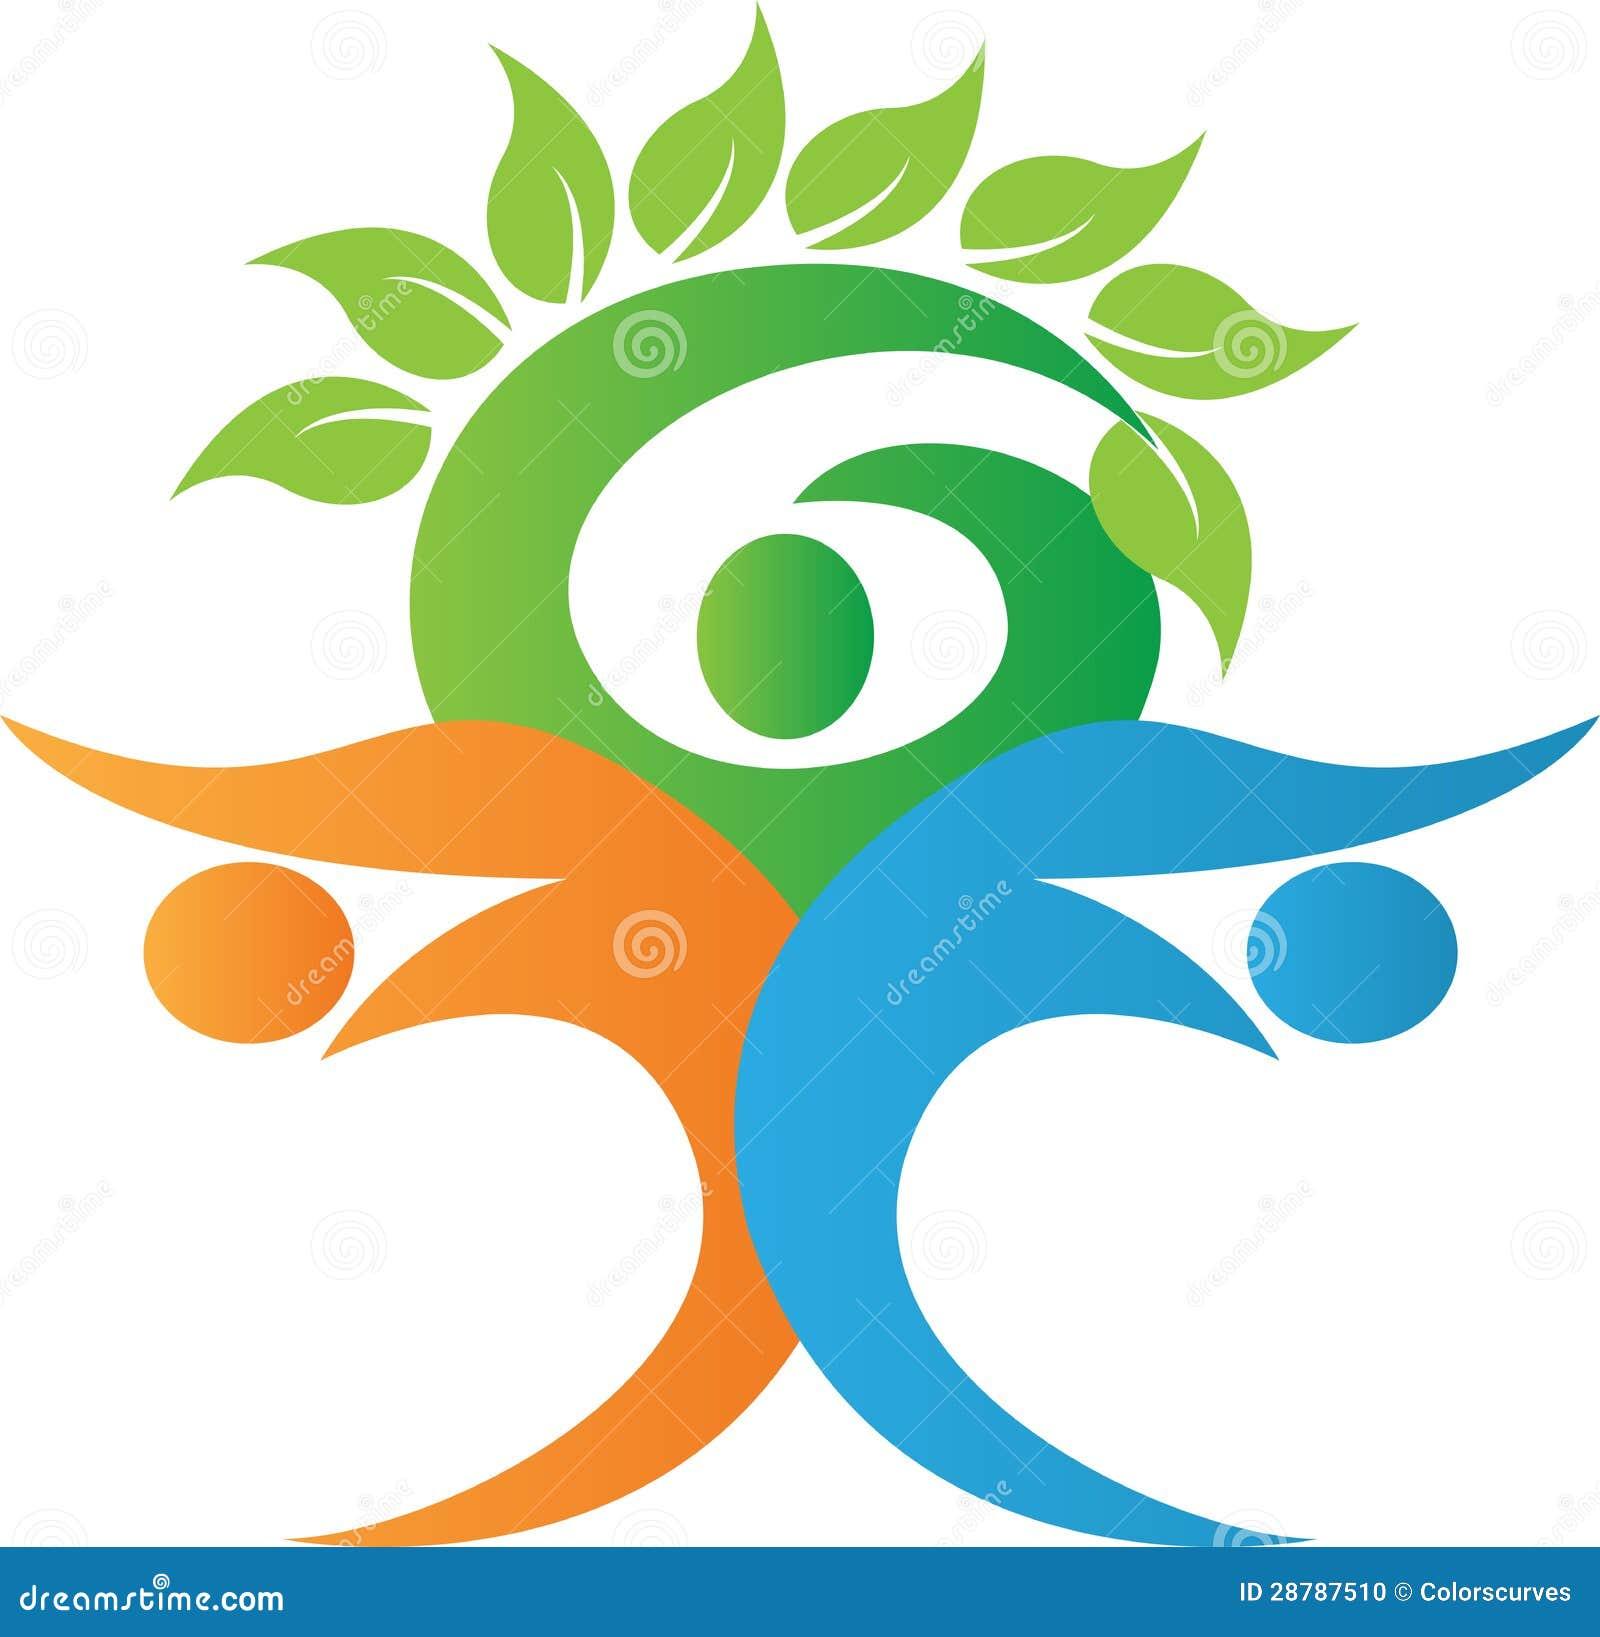 Family Tree Logo Royalty Free Stock Image - Image: 35074196